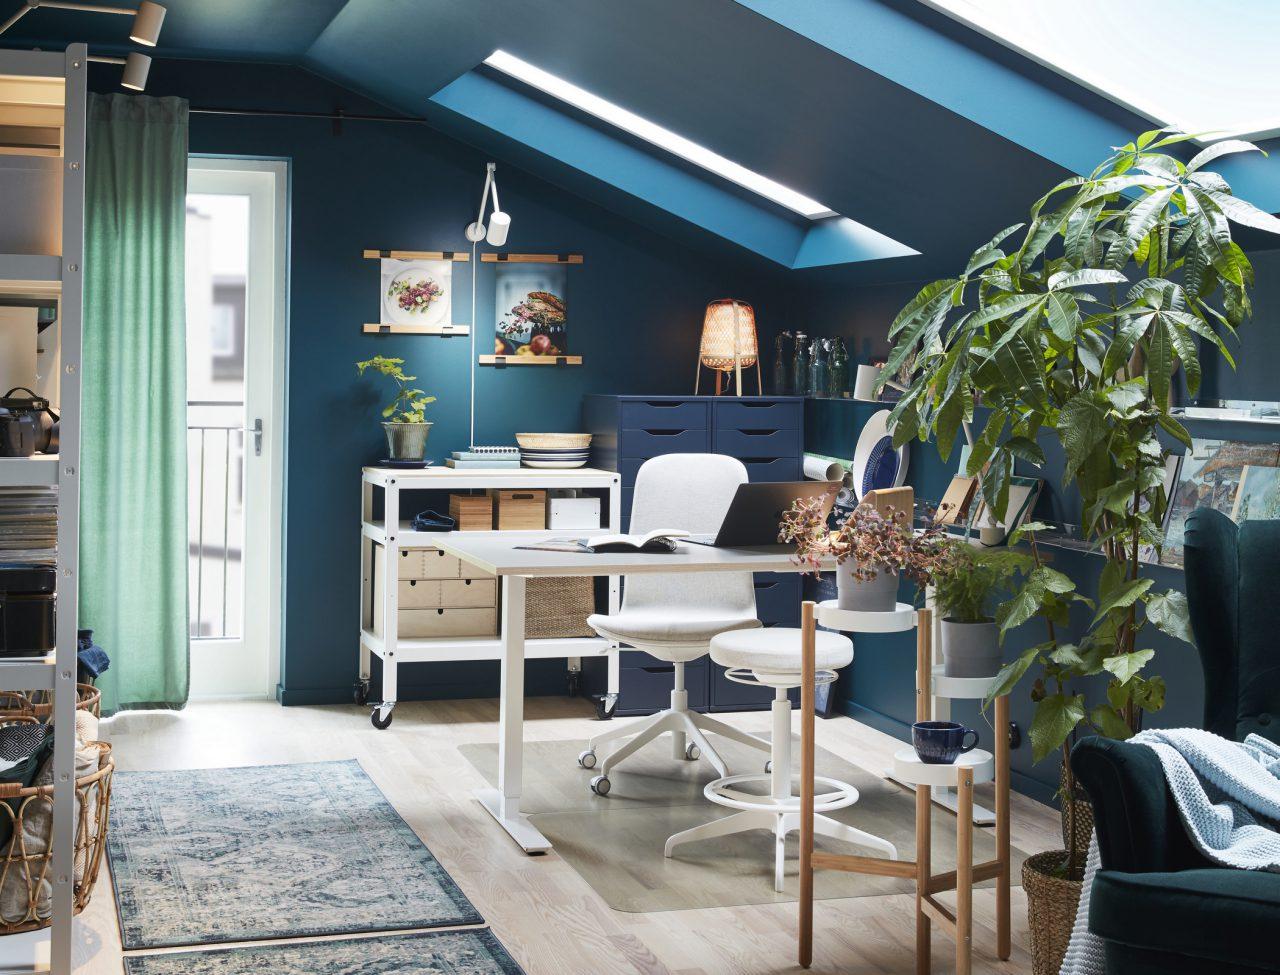 IKEA-Work-From-Home-34-1280x975.jpg